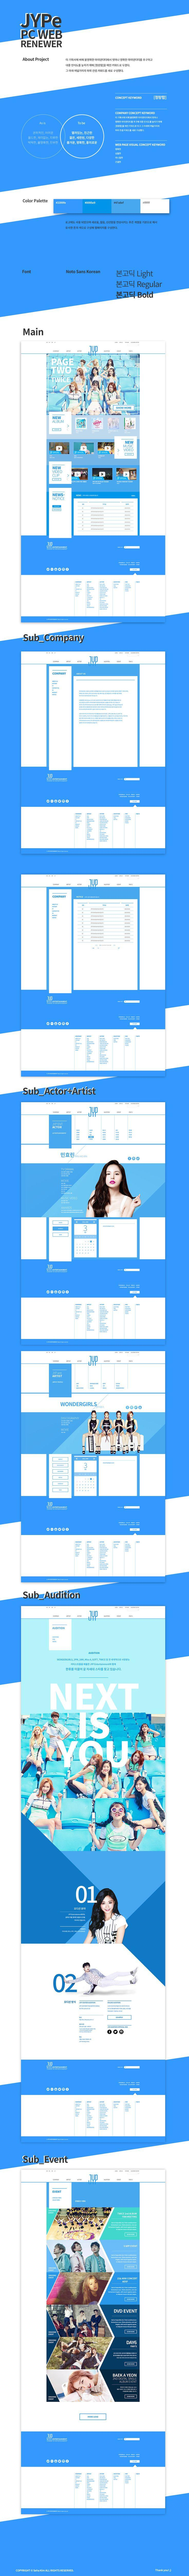 JYP Entertainment 웹사이트 리디자인 - 그래픽 디자인, 브랜딩/편집